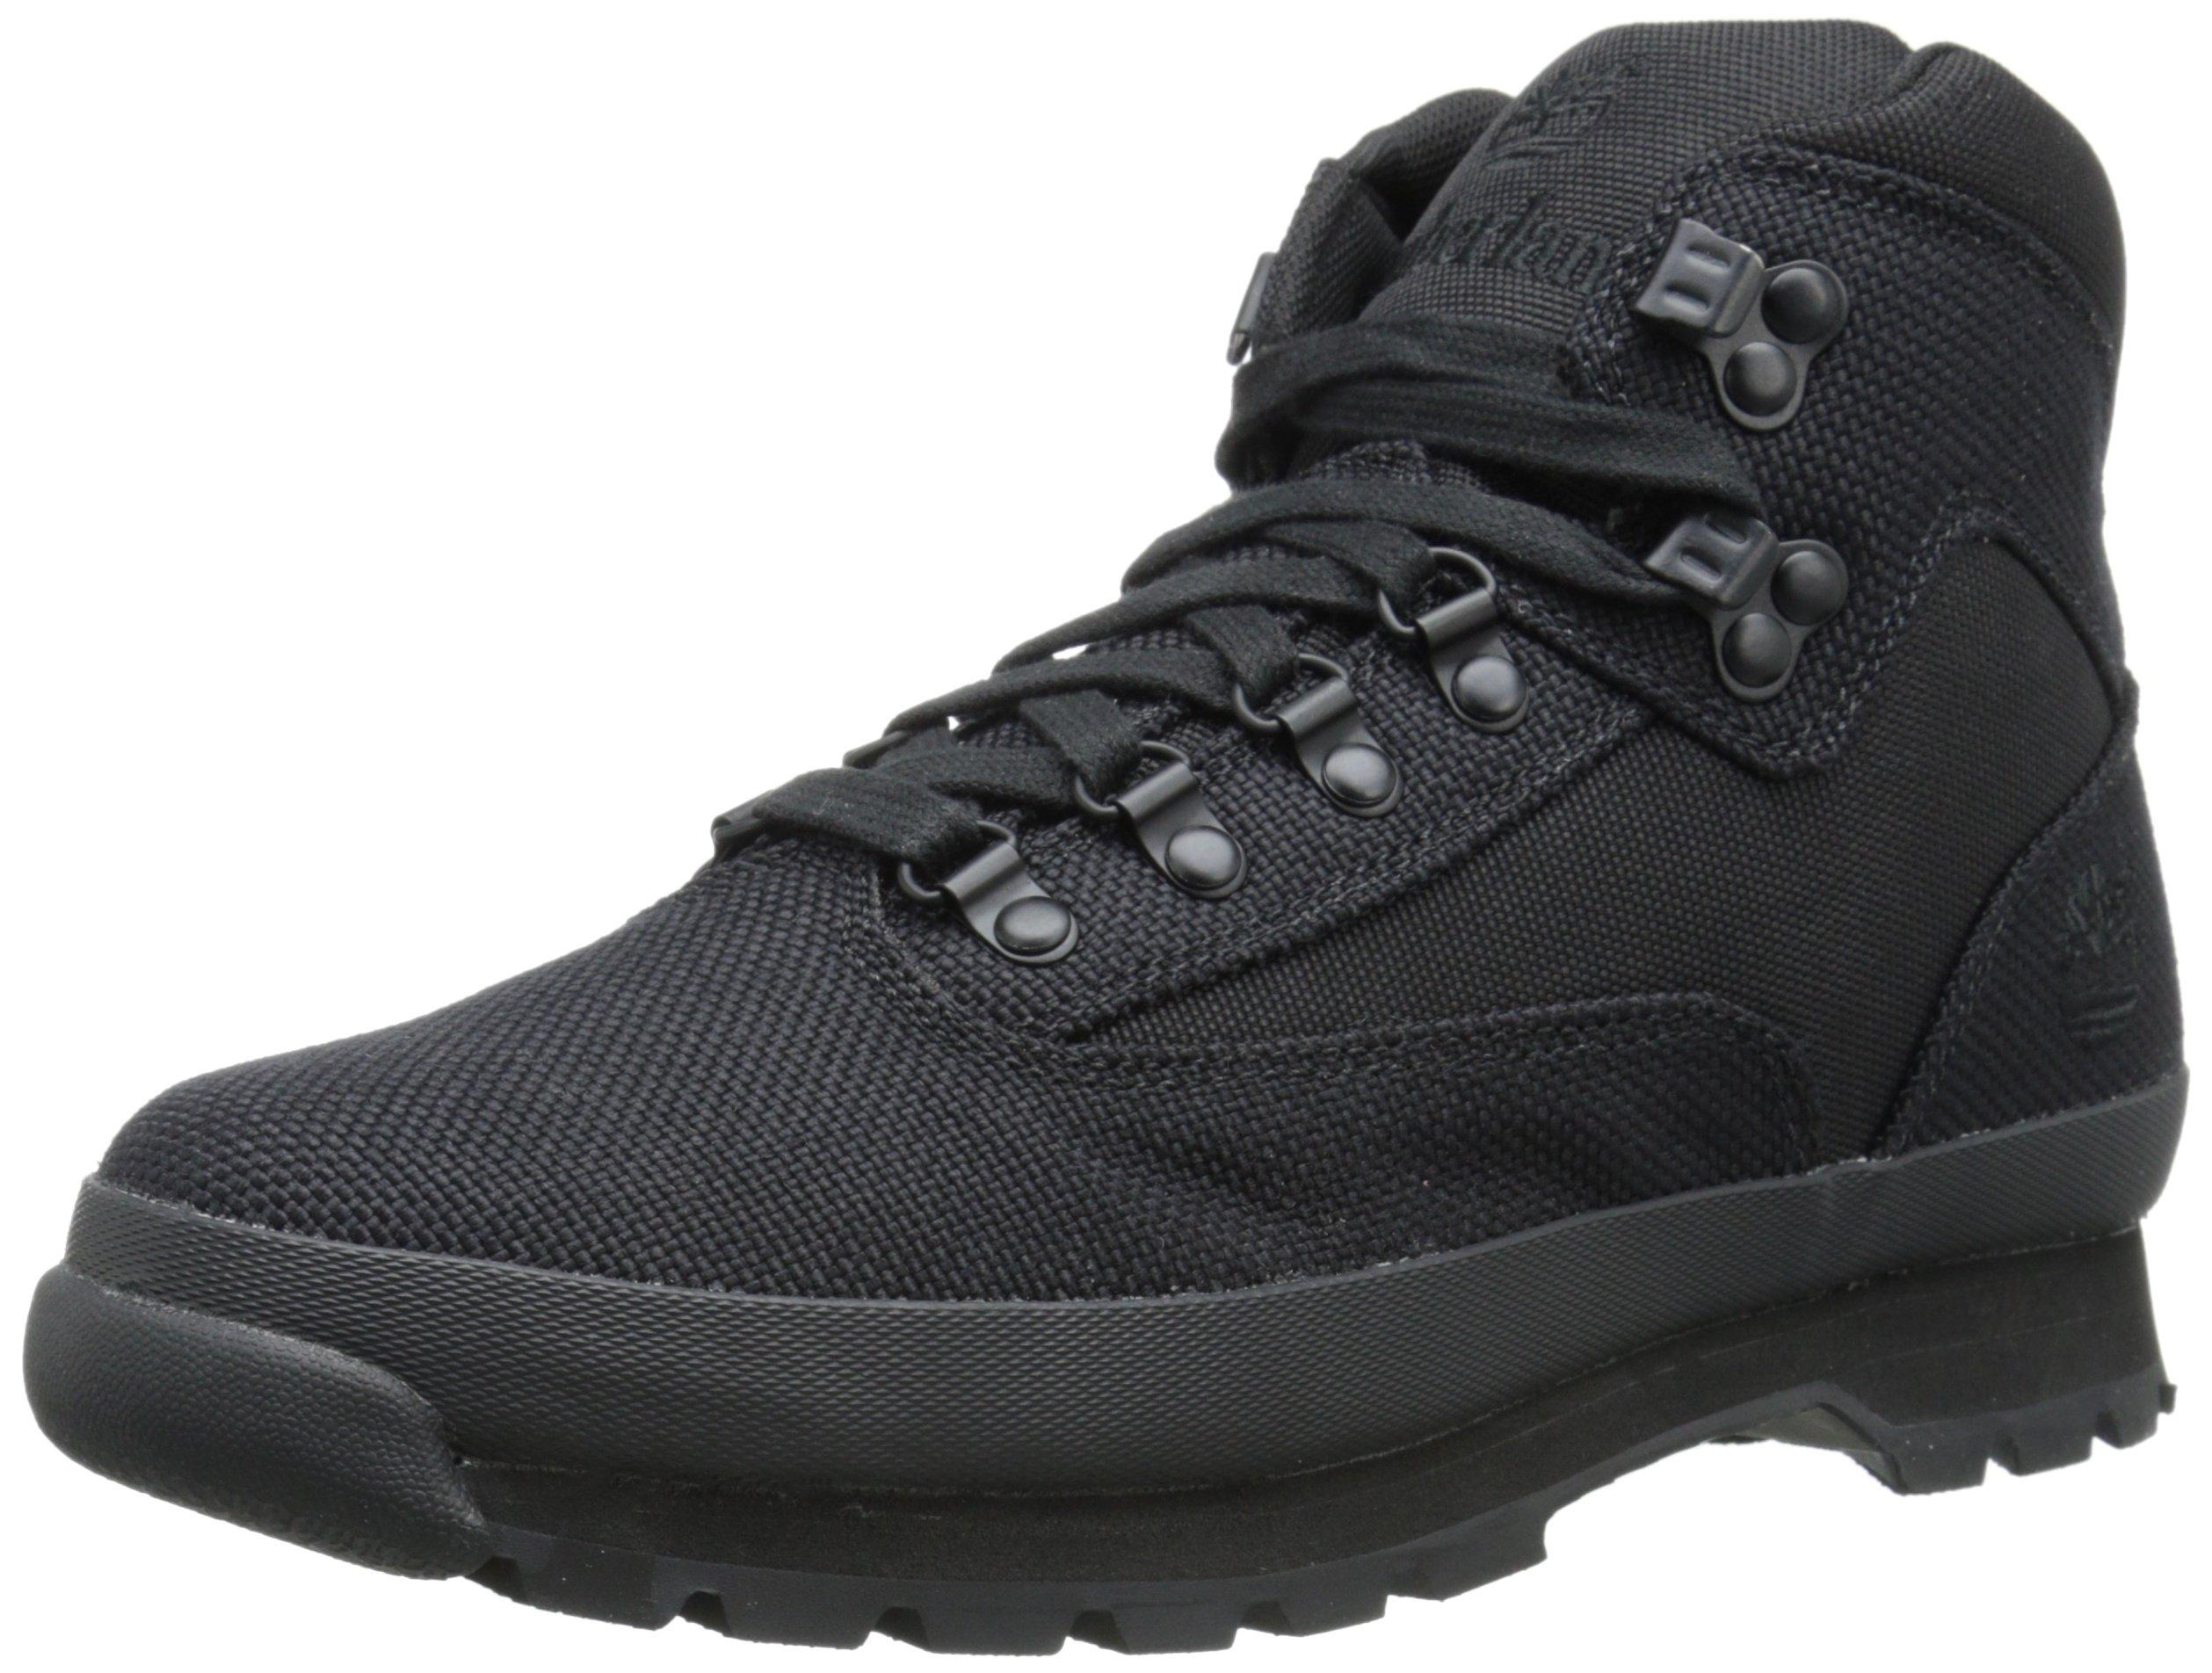 Timberland Men's Euro Hiker Mid Fabric Fashion Sneaker, Black, 12 M US